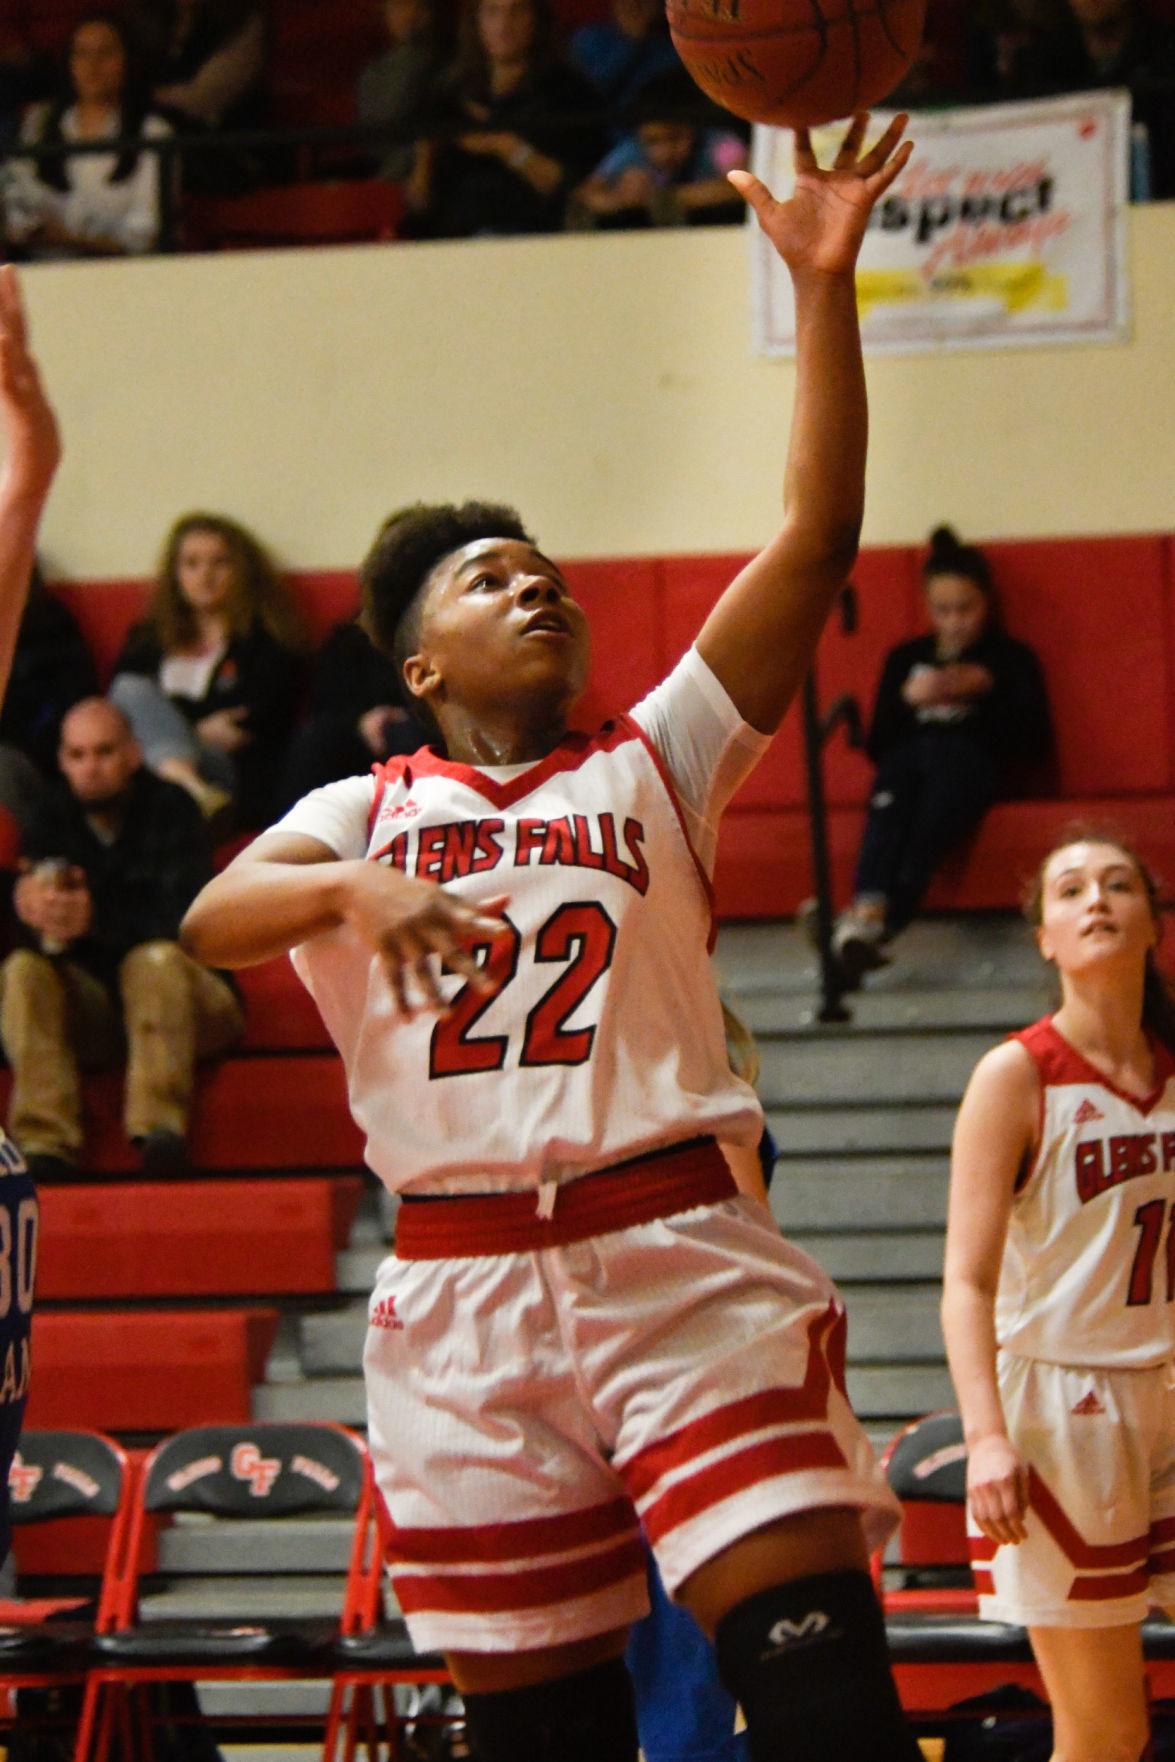 Girls Basketball -- Glens Falls vs. Ichabod Crane